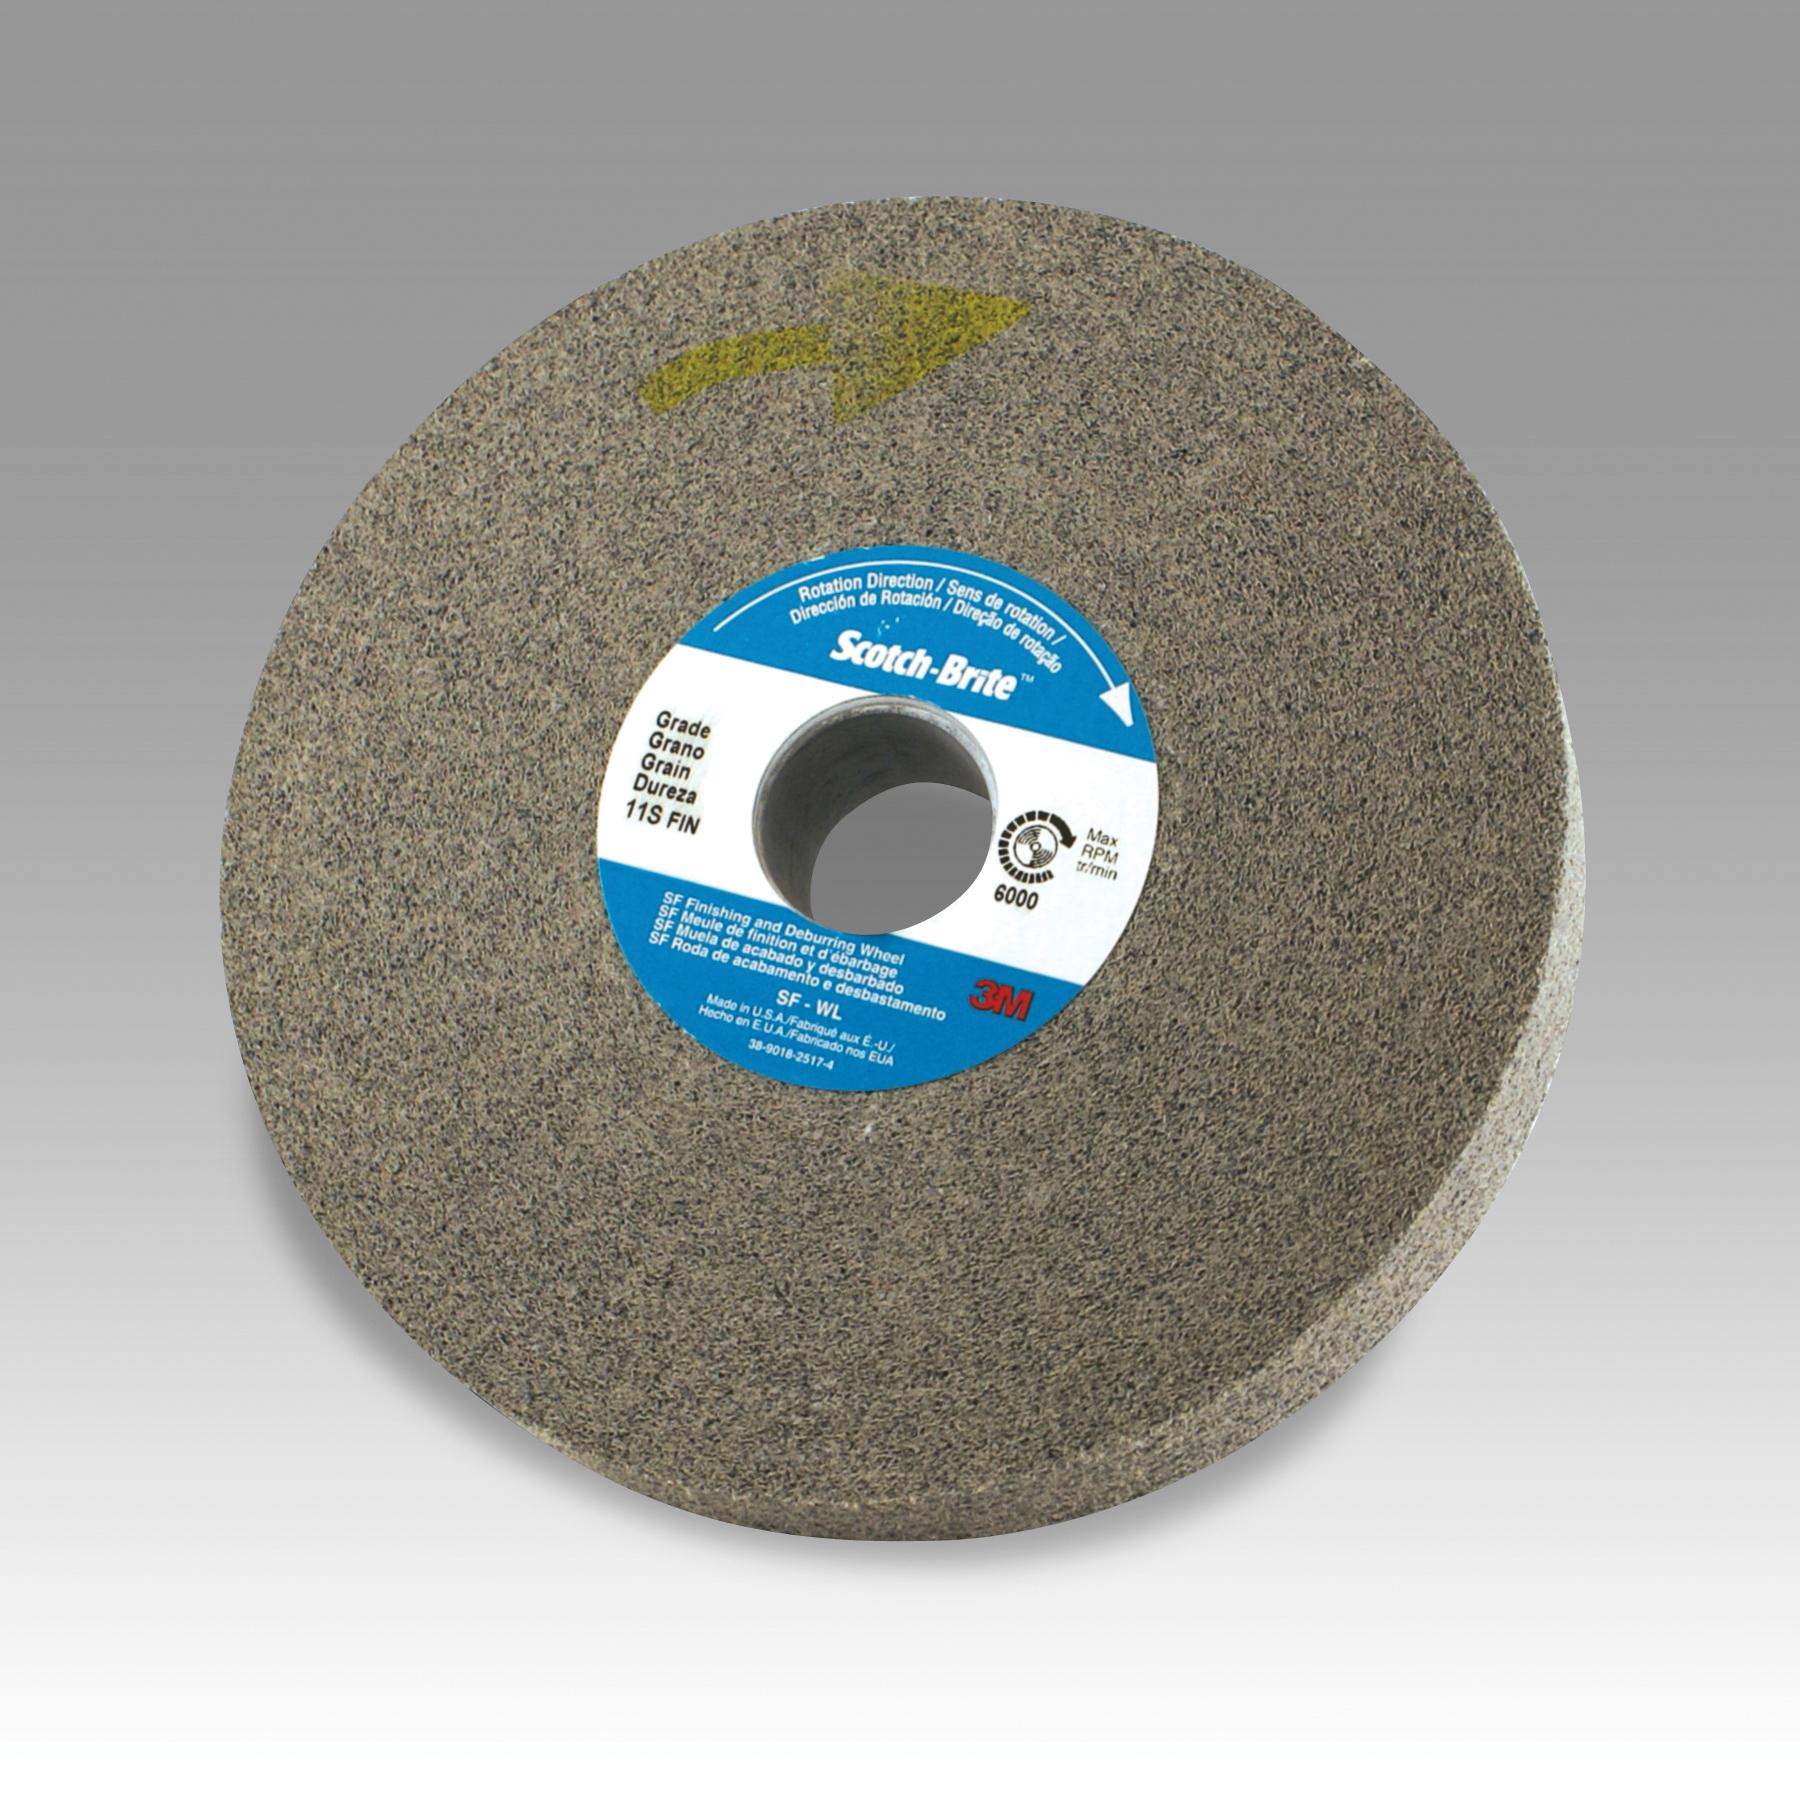 Scotch-Brite™ 048011-01574 CP-UW Cut and Polish Unitized Wheel, 3 in Dia Wheel, 1/2 in Center Hole, 1/2 in W Face, Fine Grade, Aluminum Oxide Abrasive